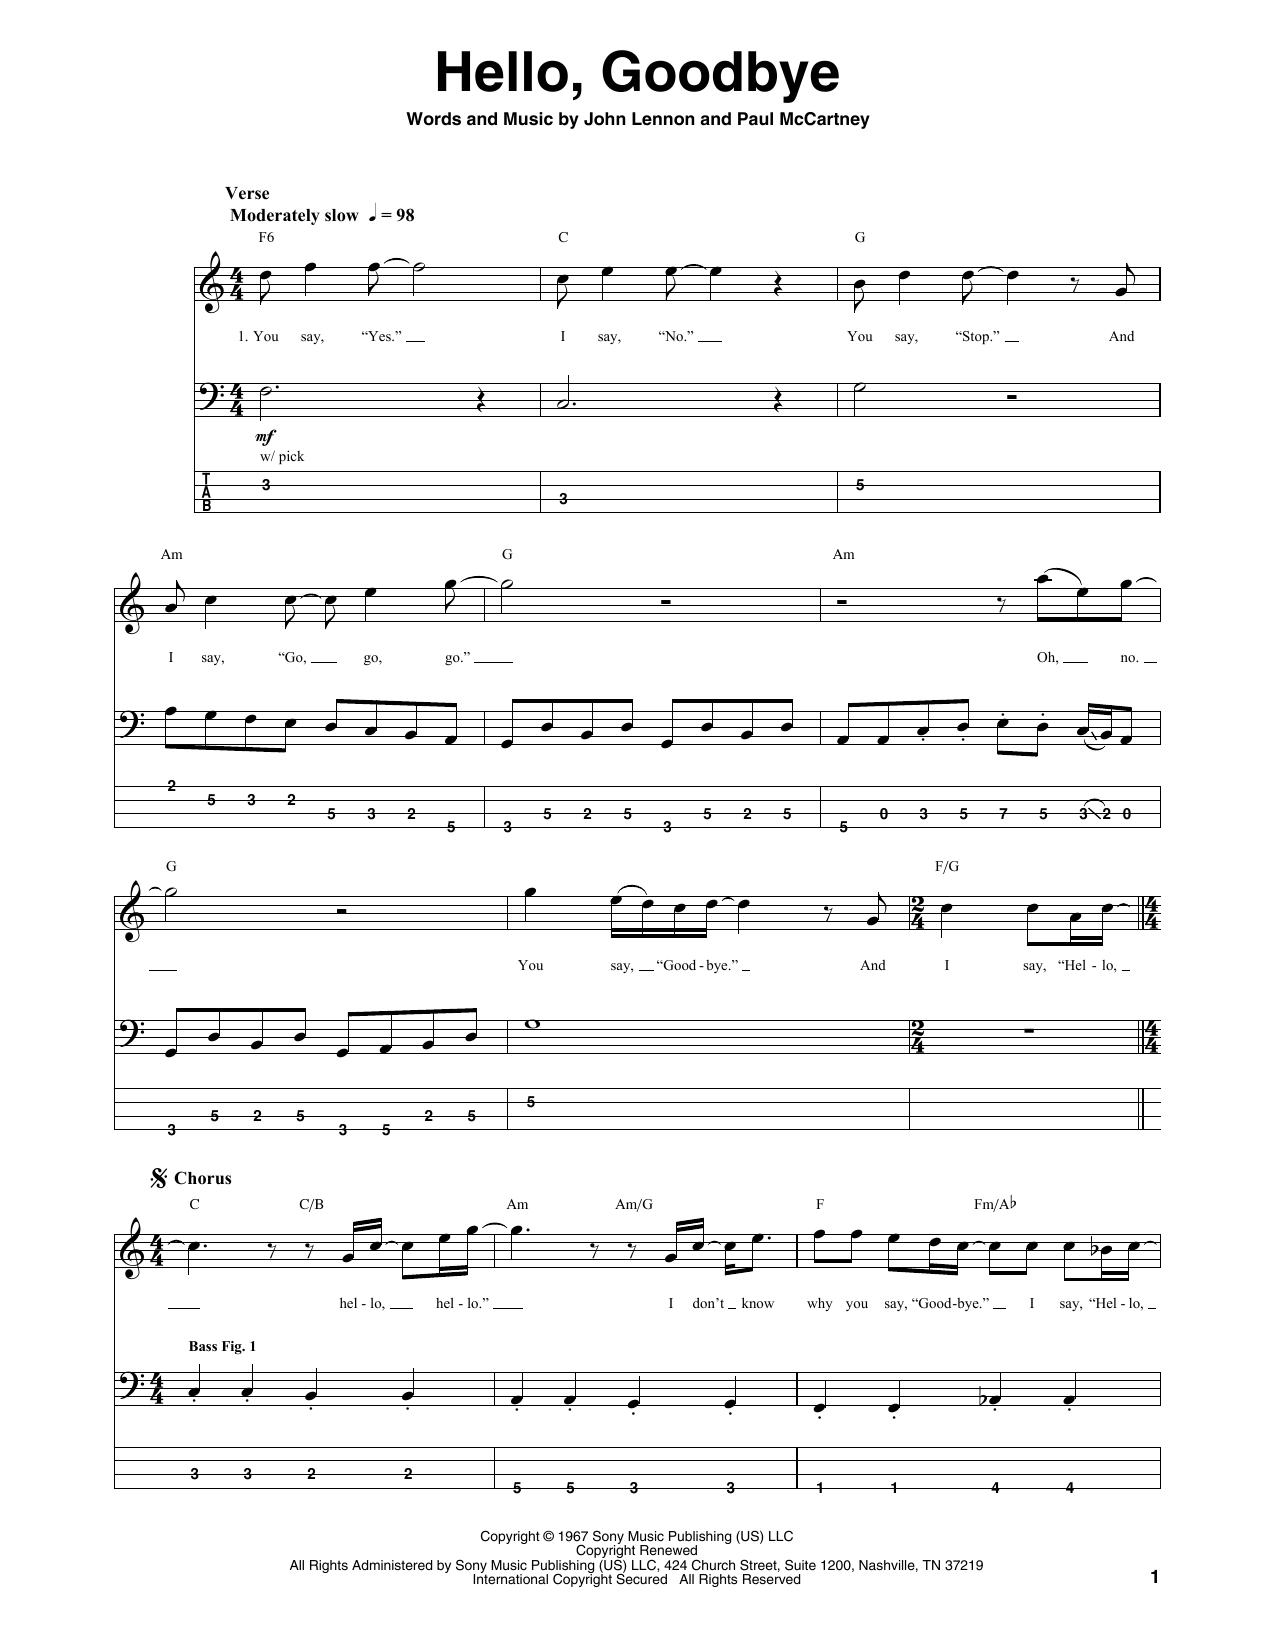 Tablature guitare Hello, Goodbye de The Beatles - Tablature Basse